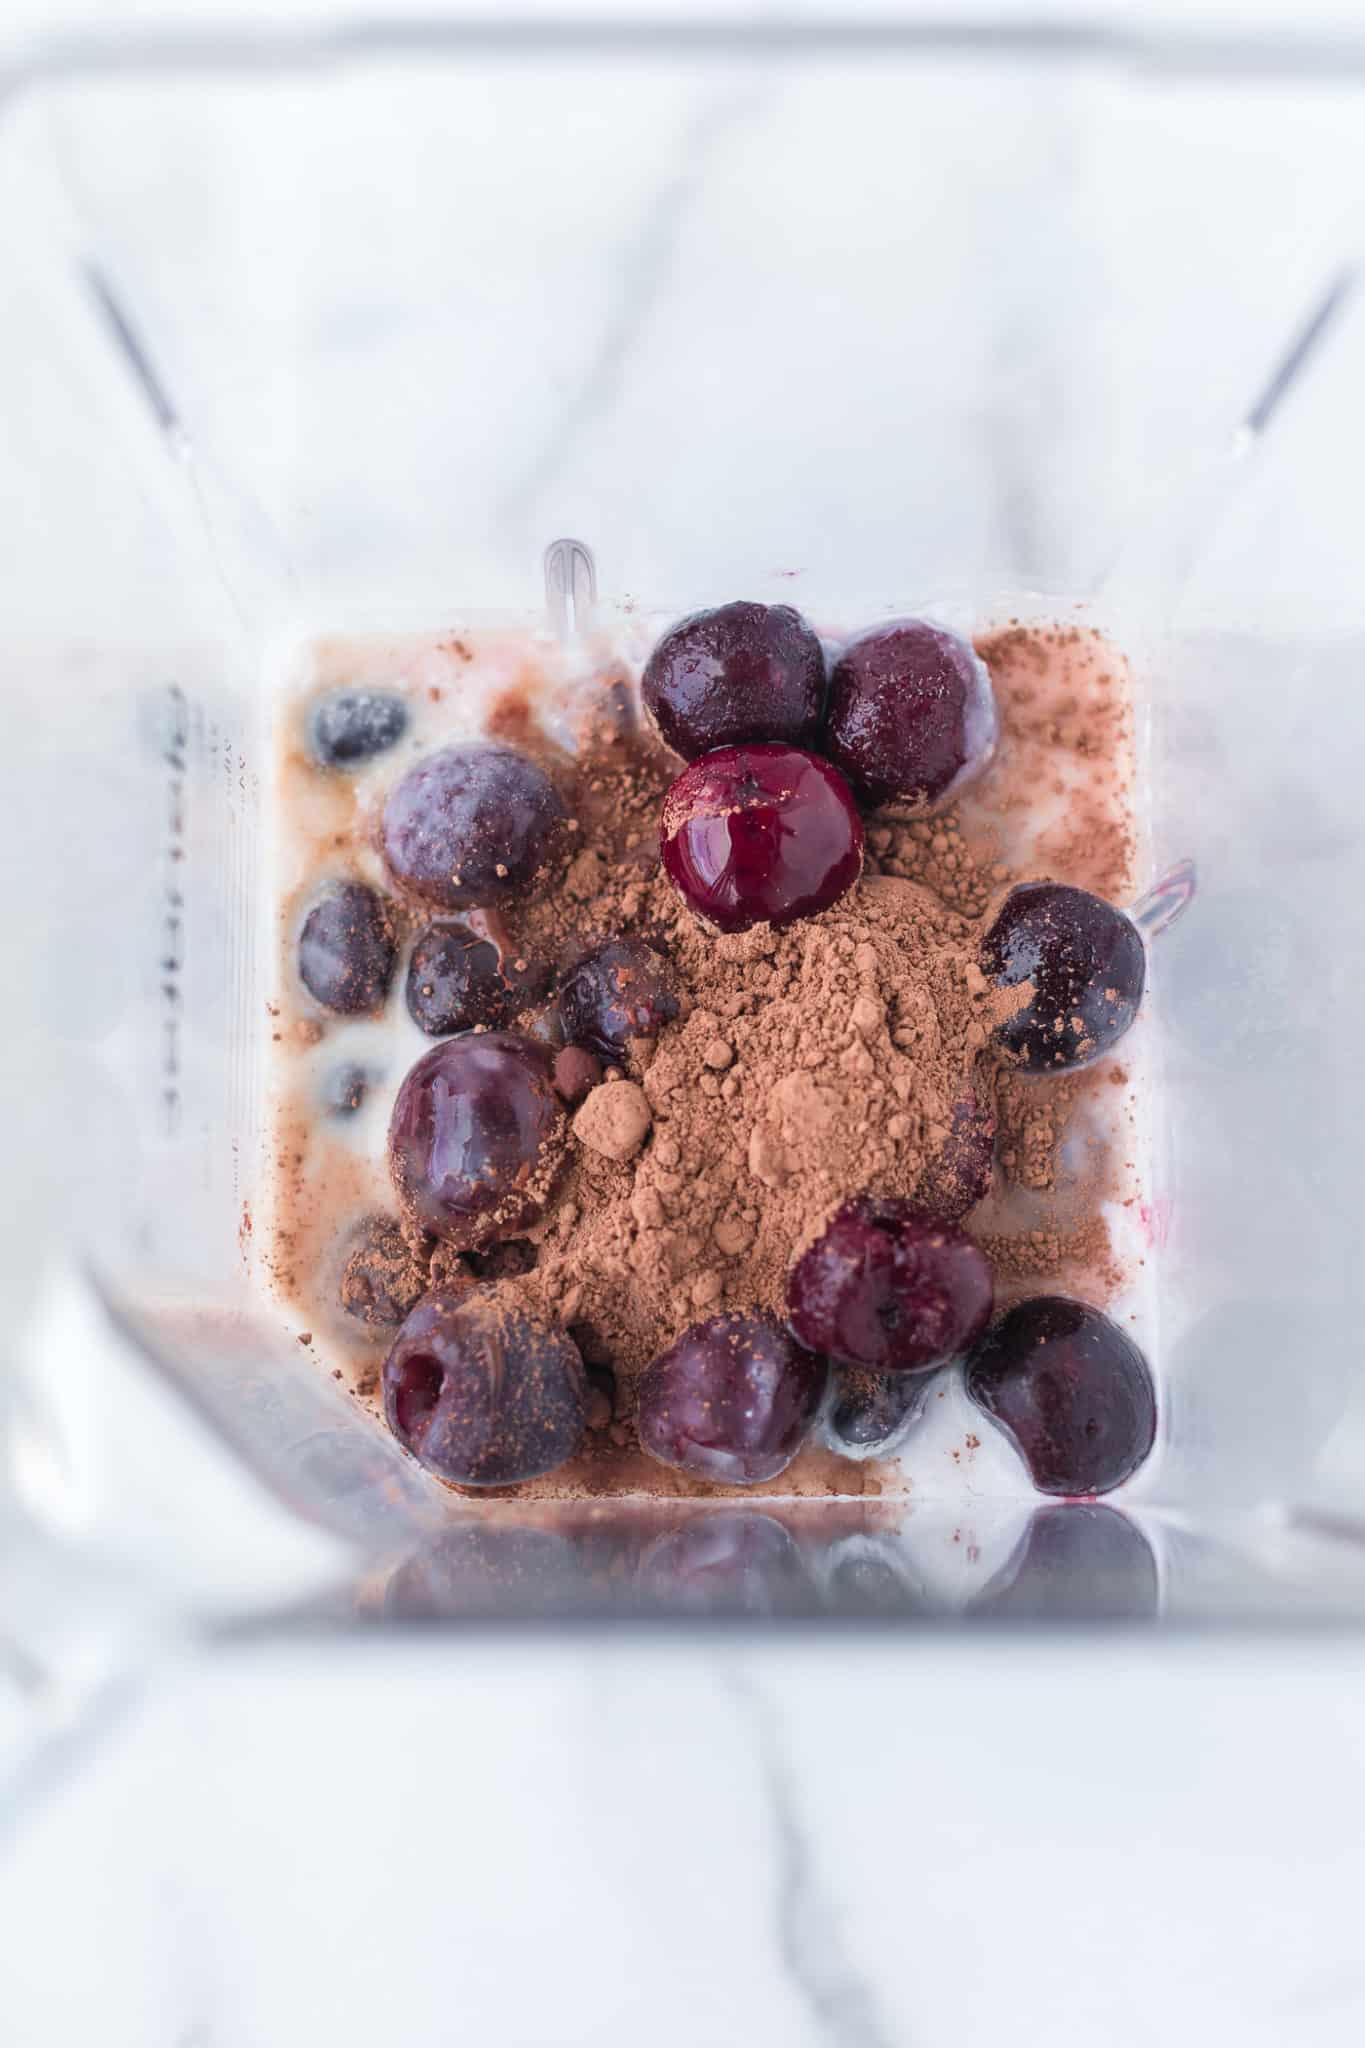 ingredients for cherry smoothie in a blendtec blender